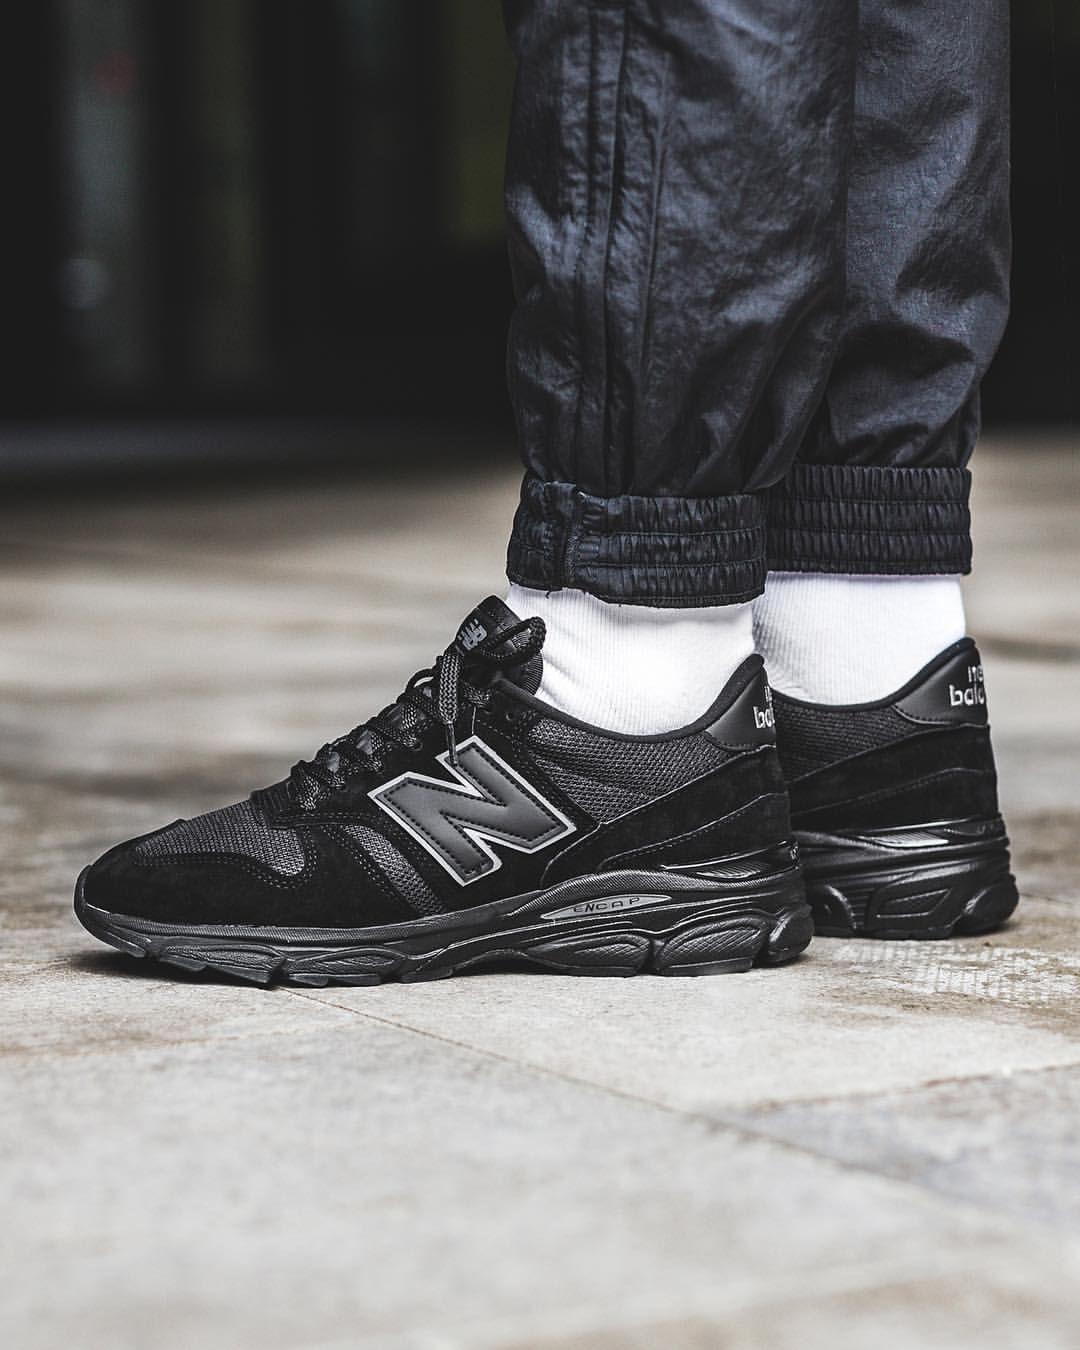 6a277aca633c8 New Balance 770.9: Black | Sneakers: New Balance 770 | New balance ...